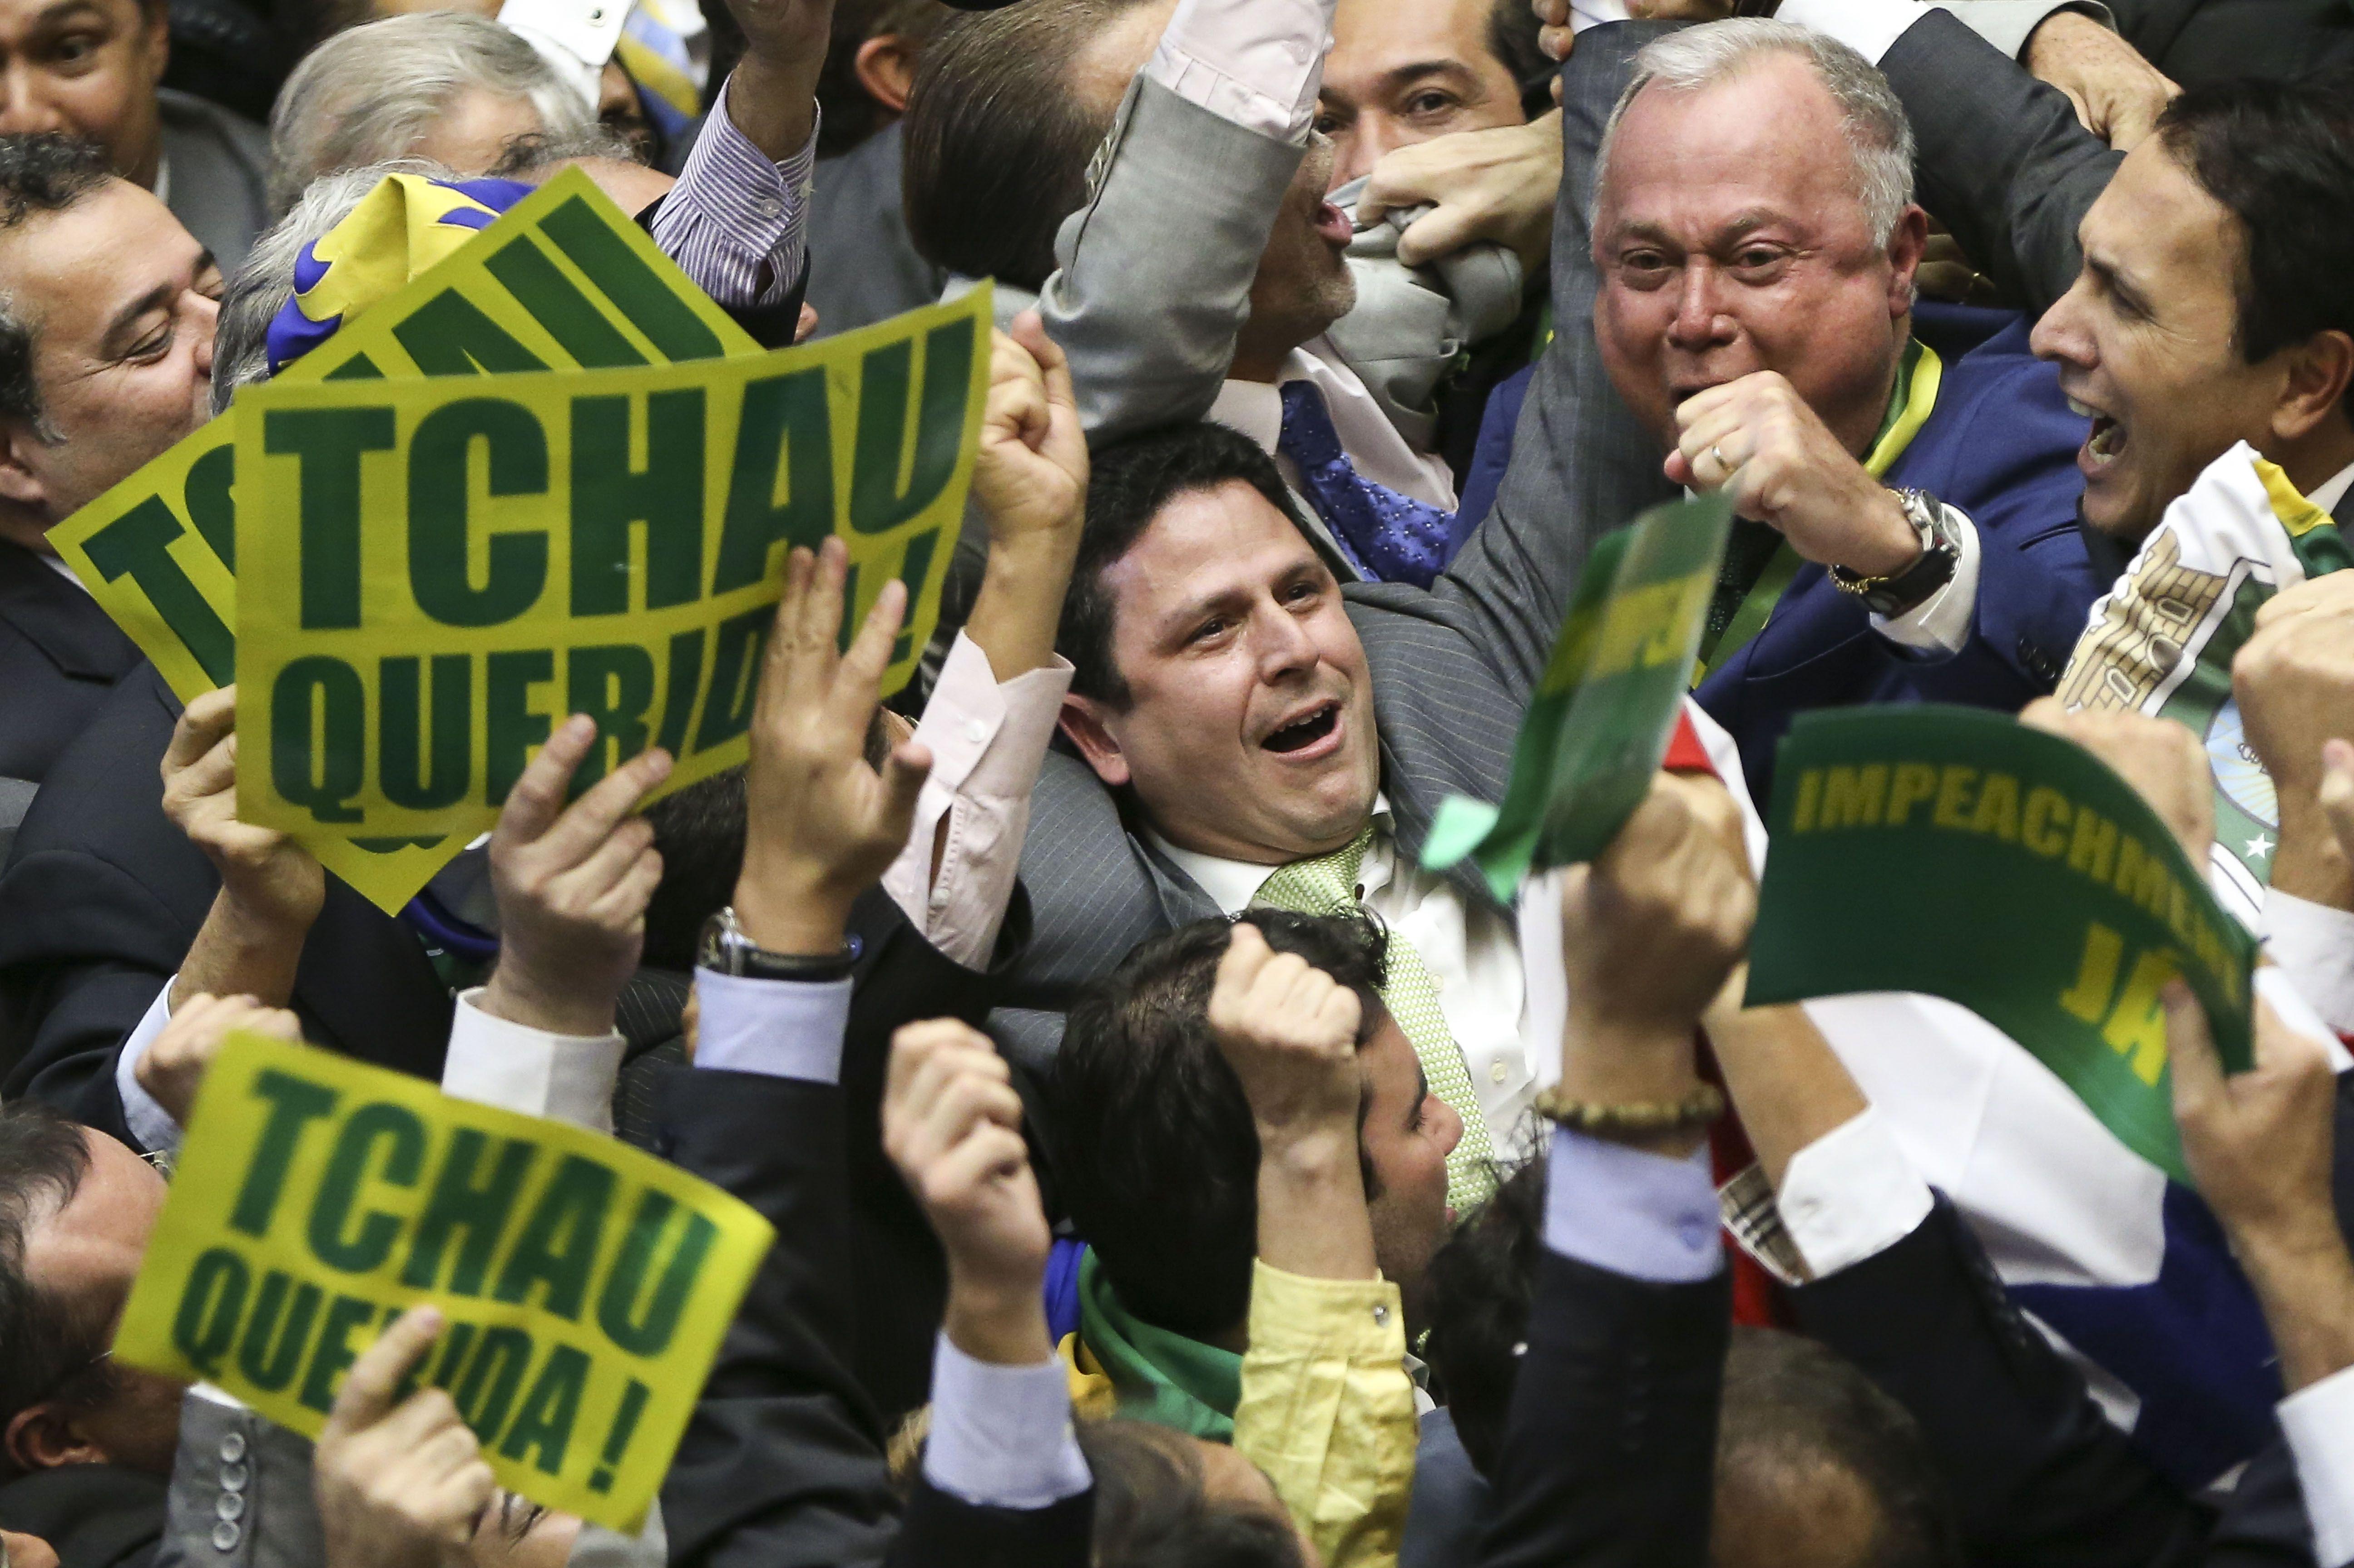 Câmara aceitou o pedido de impeachment de Dilma - Marcelo Camargo/Agência Brasil/ND